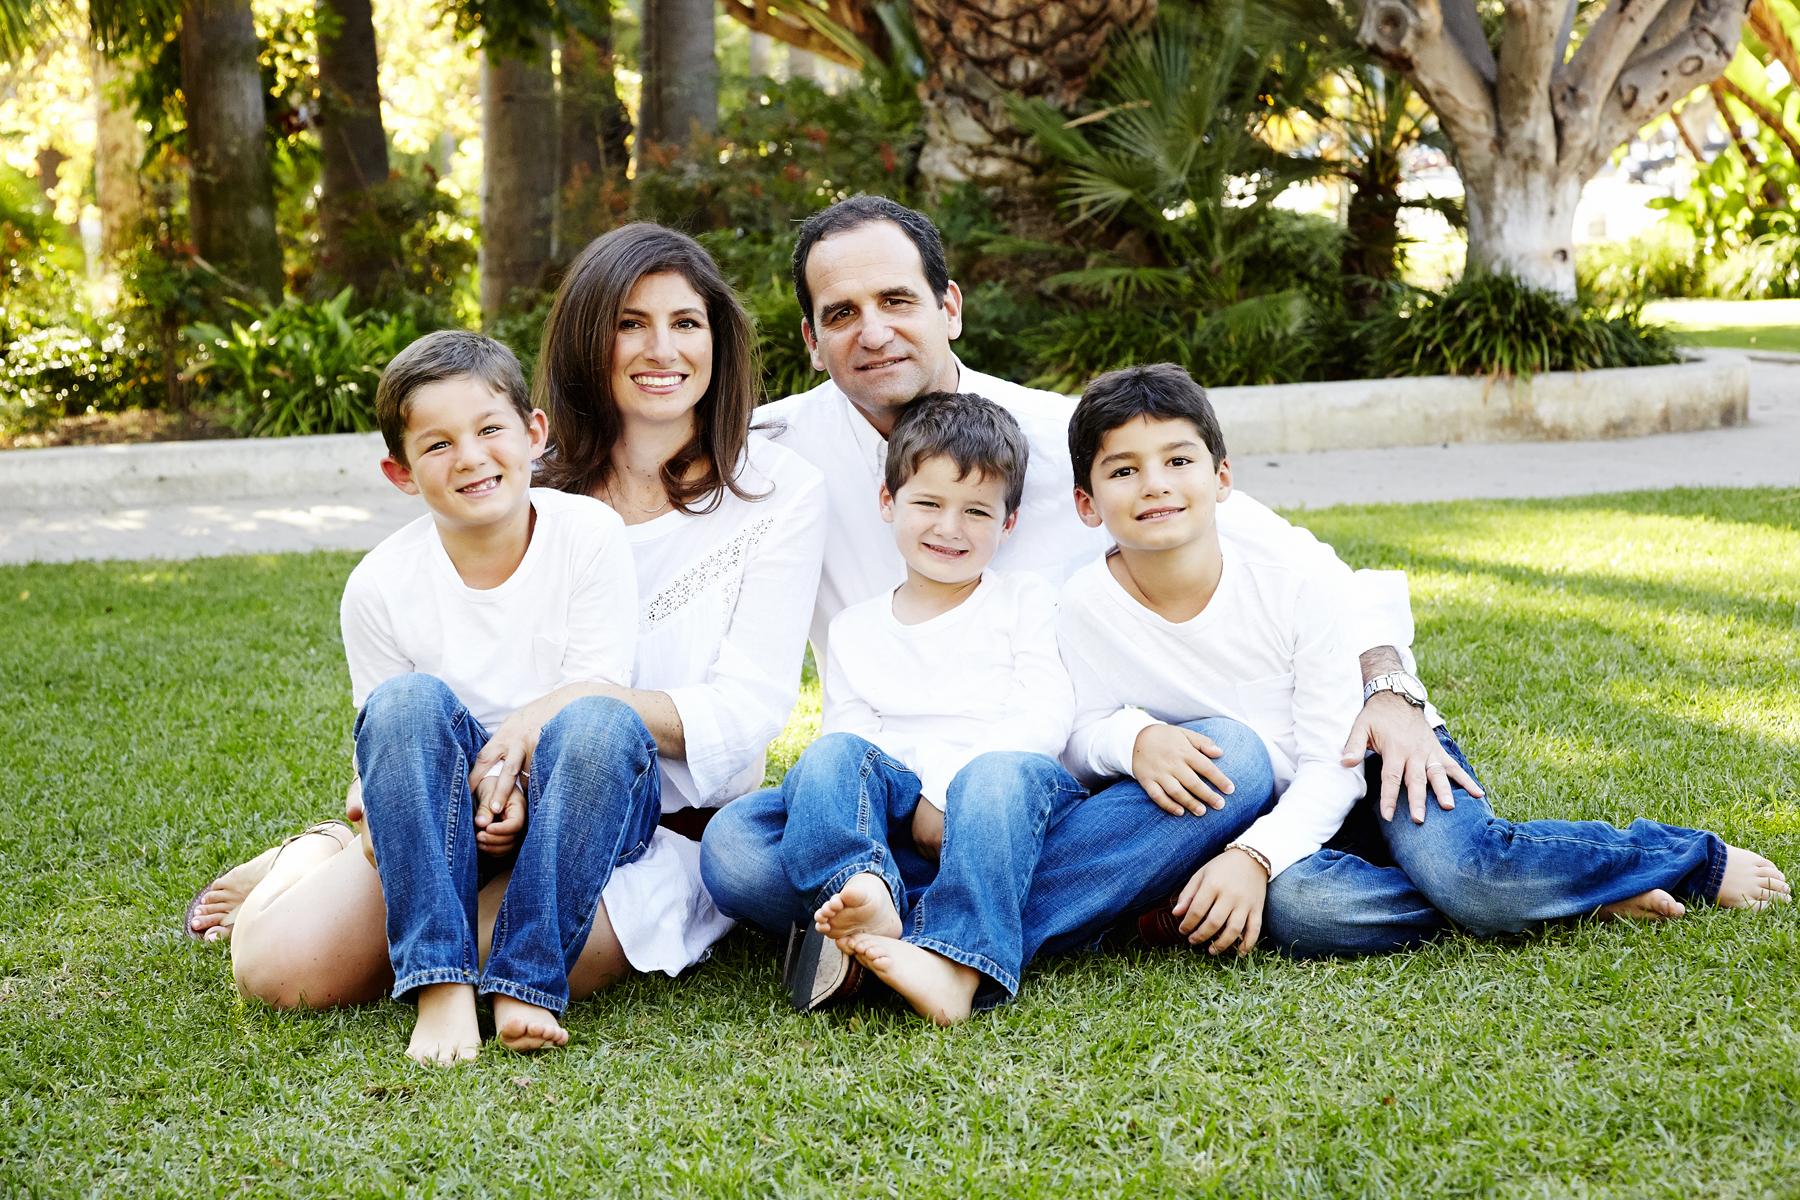 Outdoor family photography Barrington, IL | Golden ... |Outdoor Family Photography